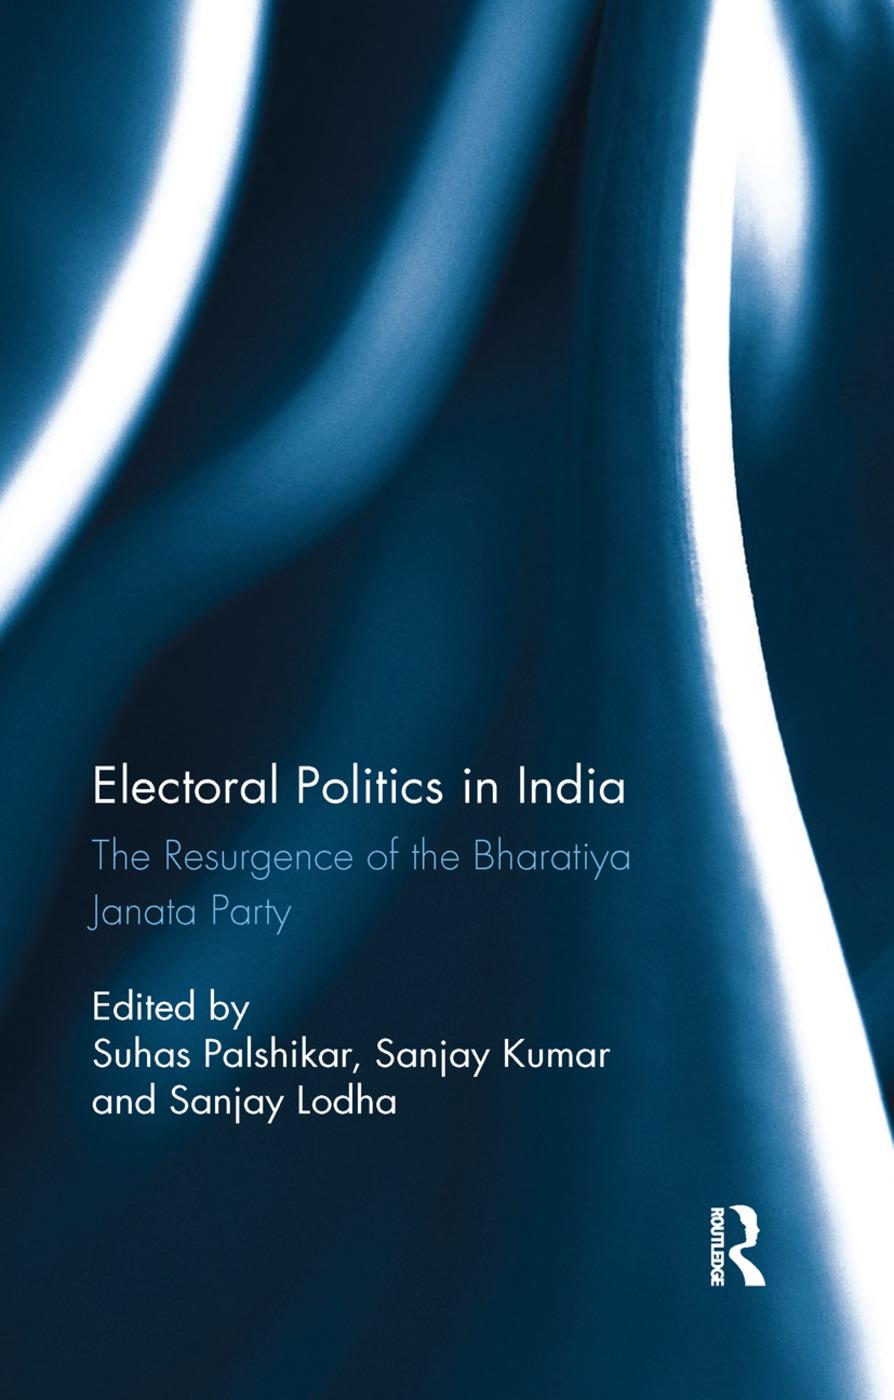 Electoral Politics in India: The Resurgence of the Bharatiya Janata Party book cover